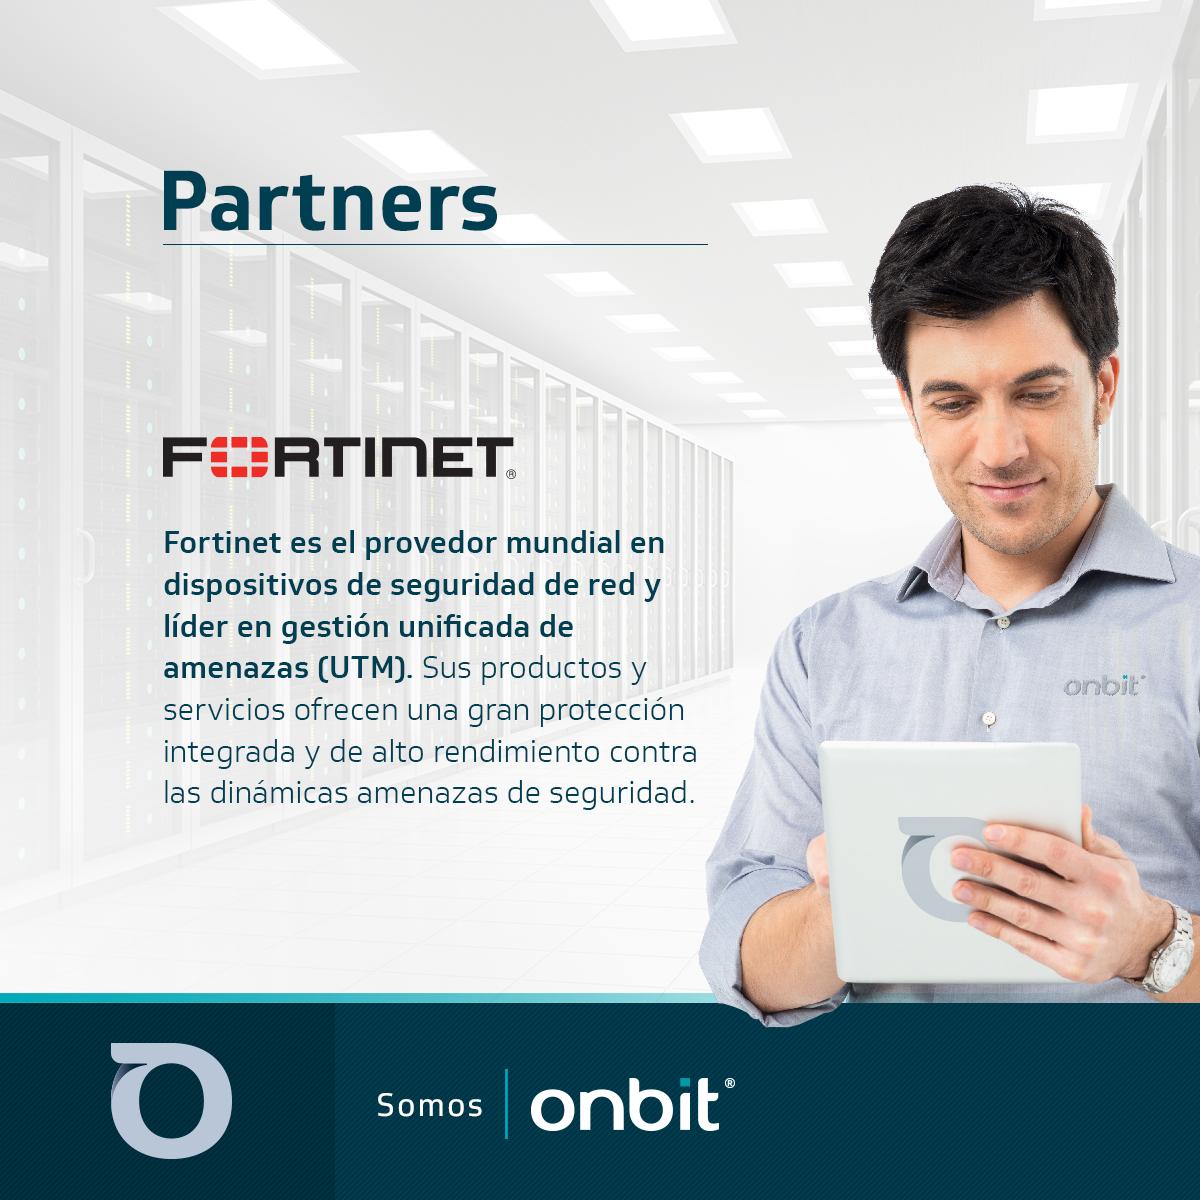 onbit_partners_fortinet